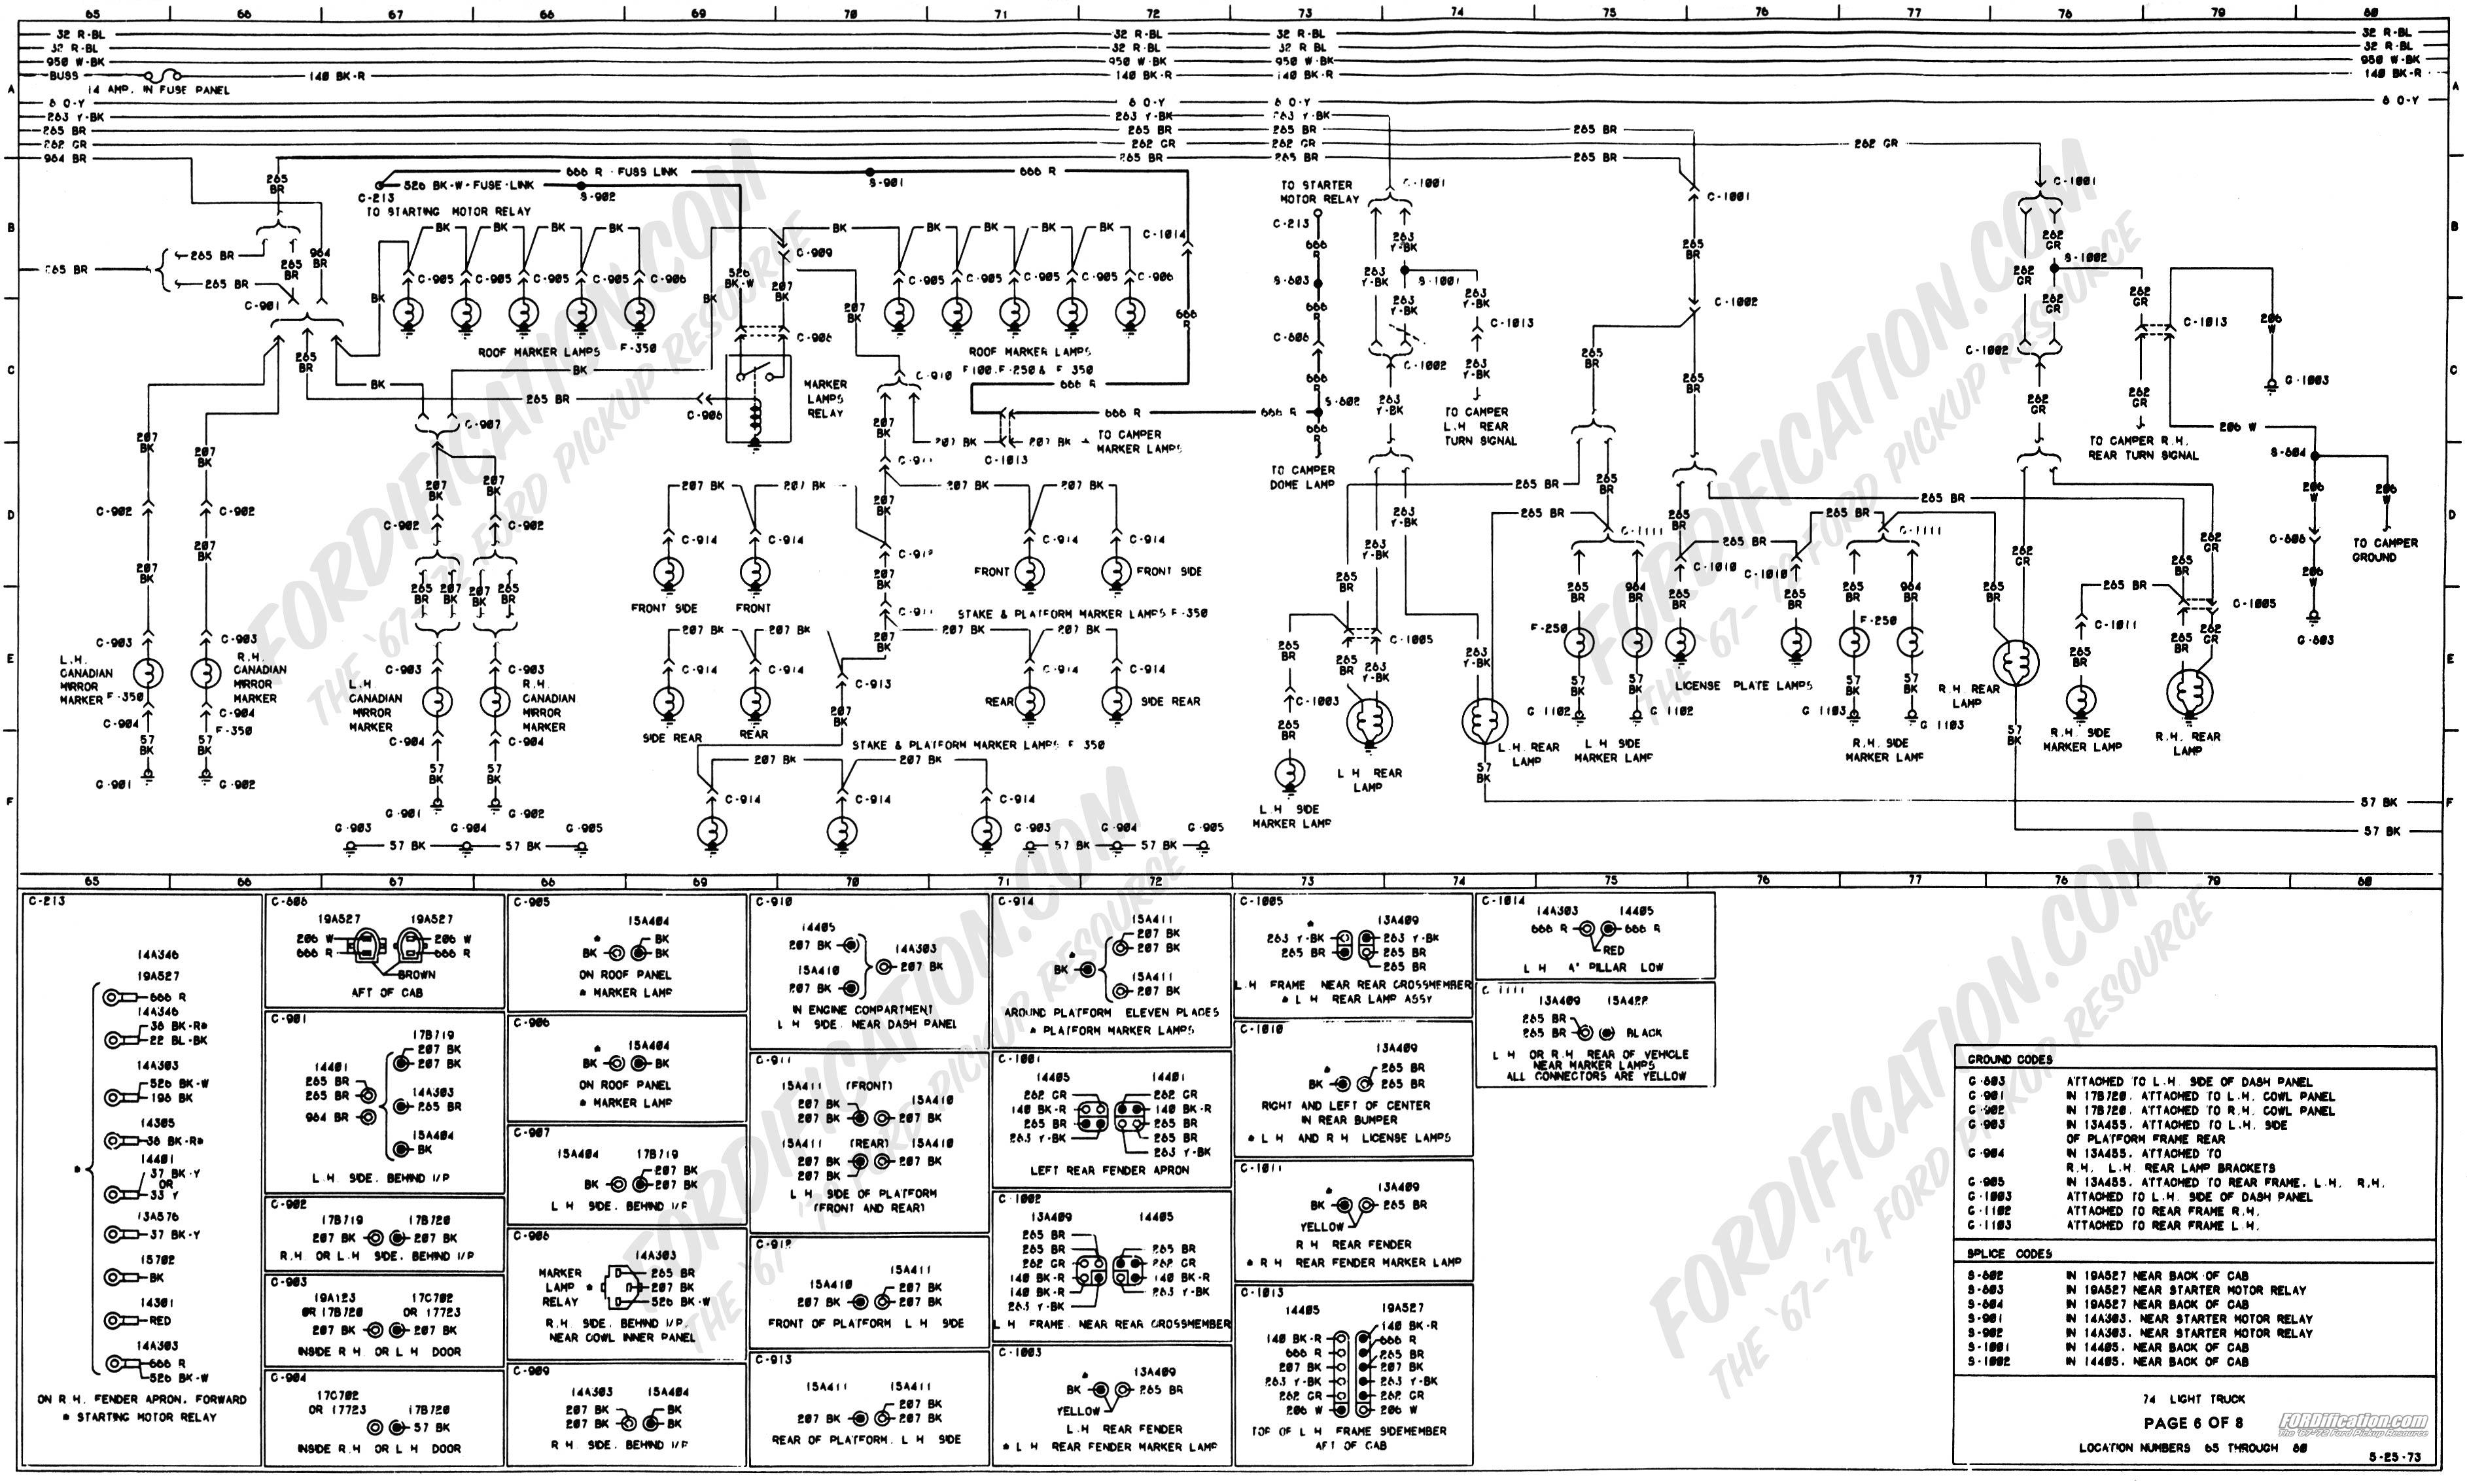 F250 Ford Wiring Diagram | Manual E-Books - Ford Wiring Diagram